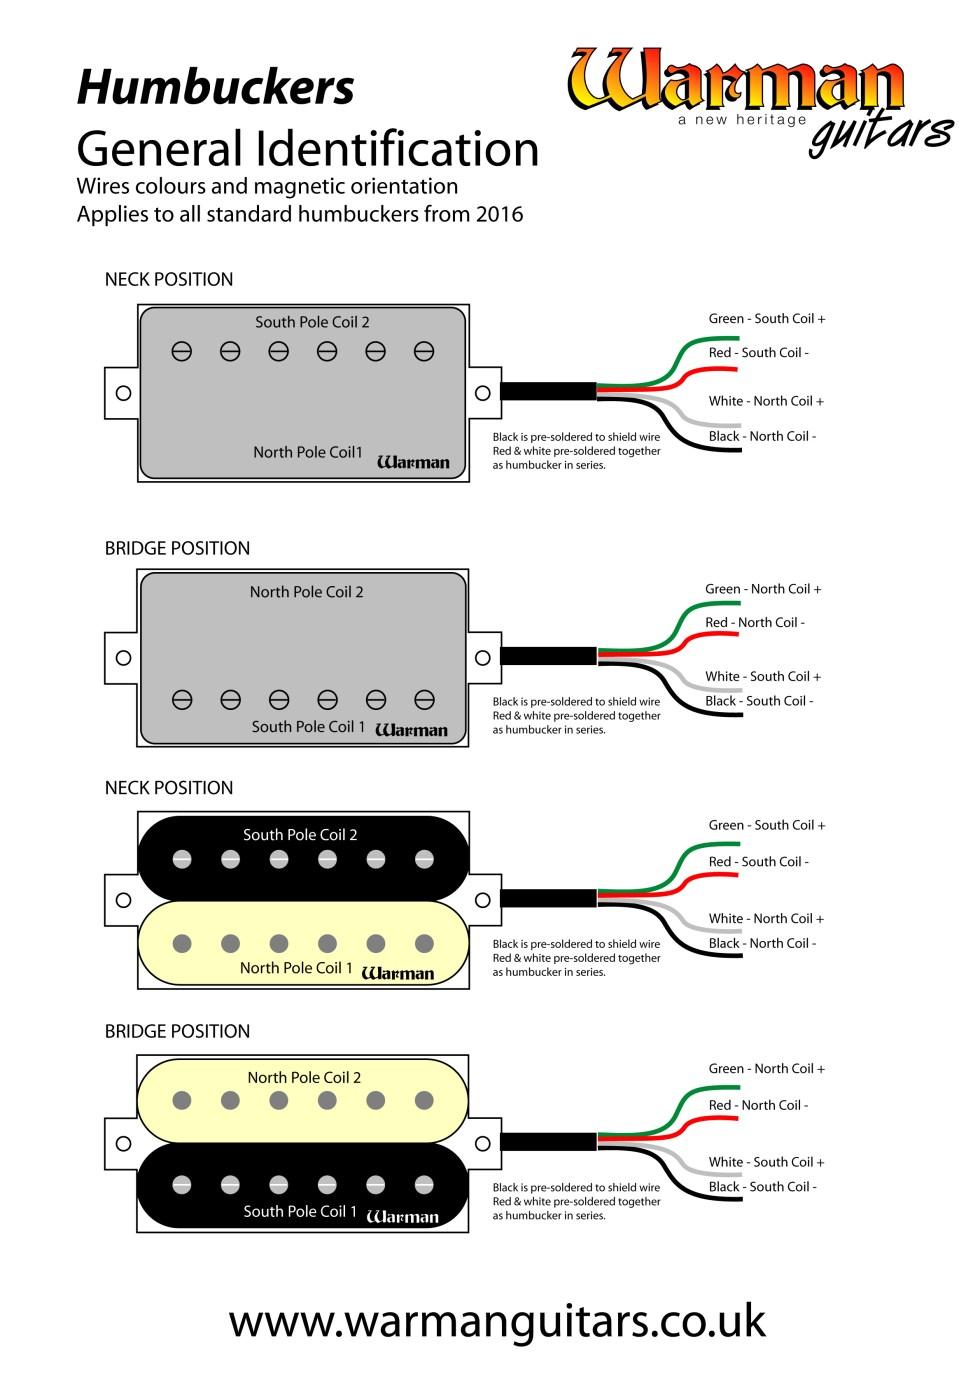 Humbucker wire colours – Warman Guitars on